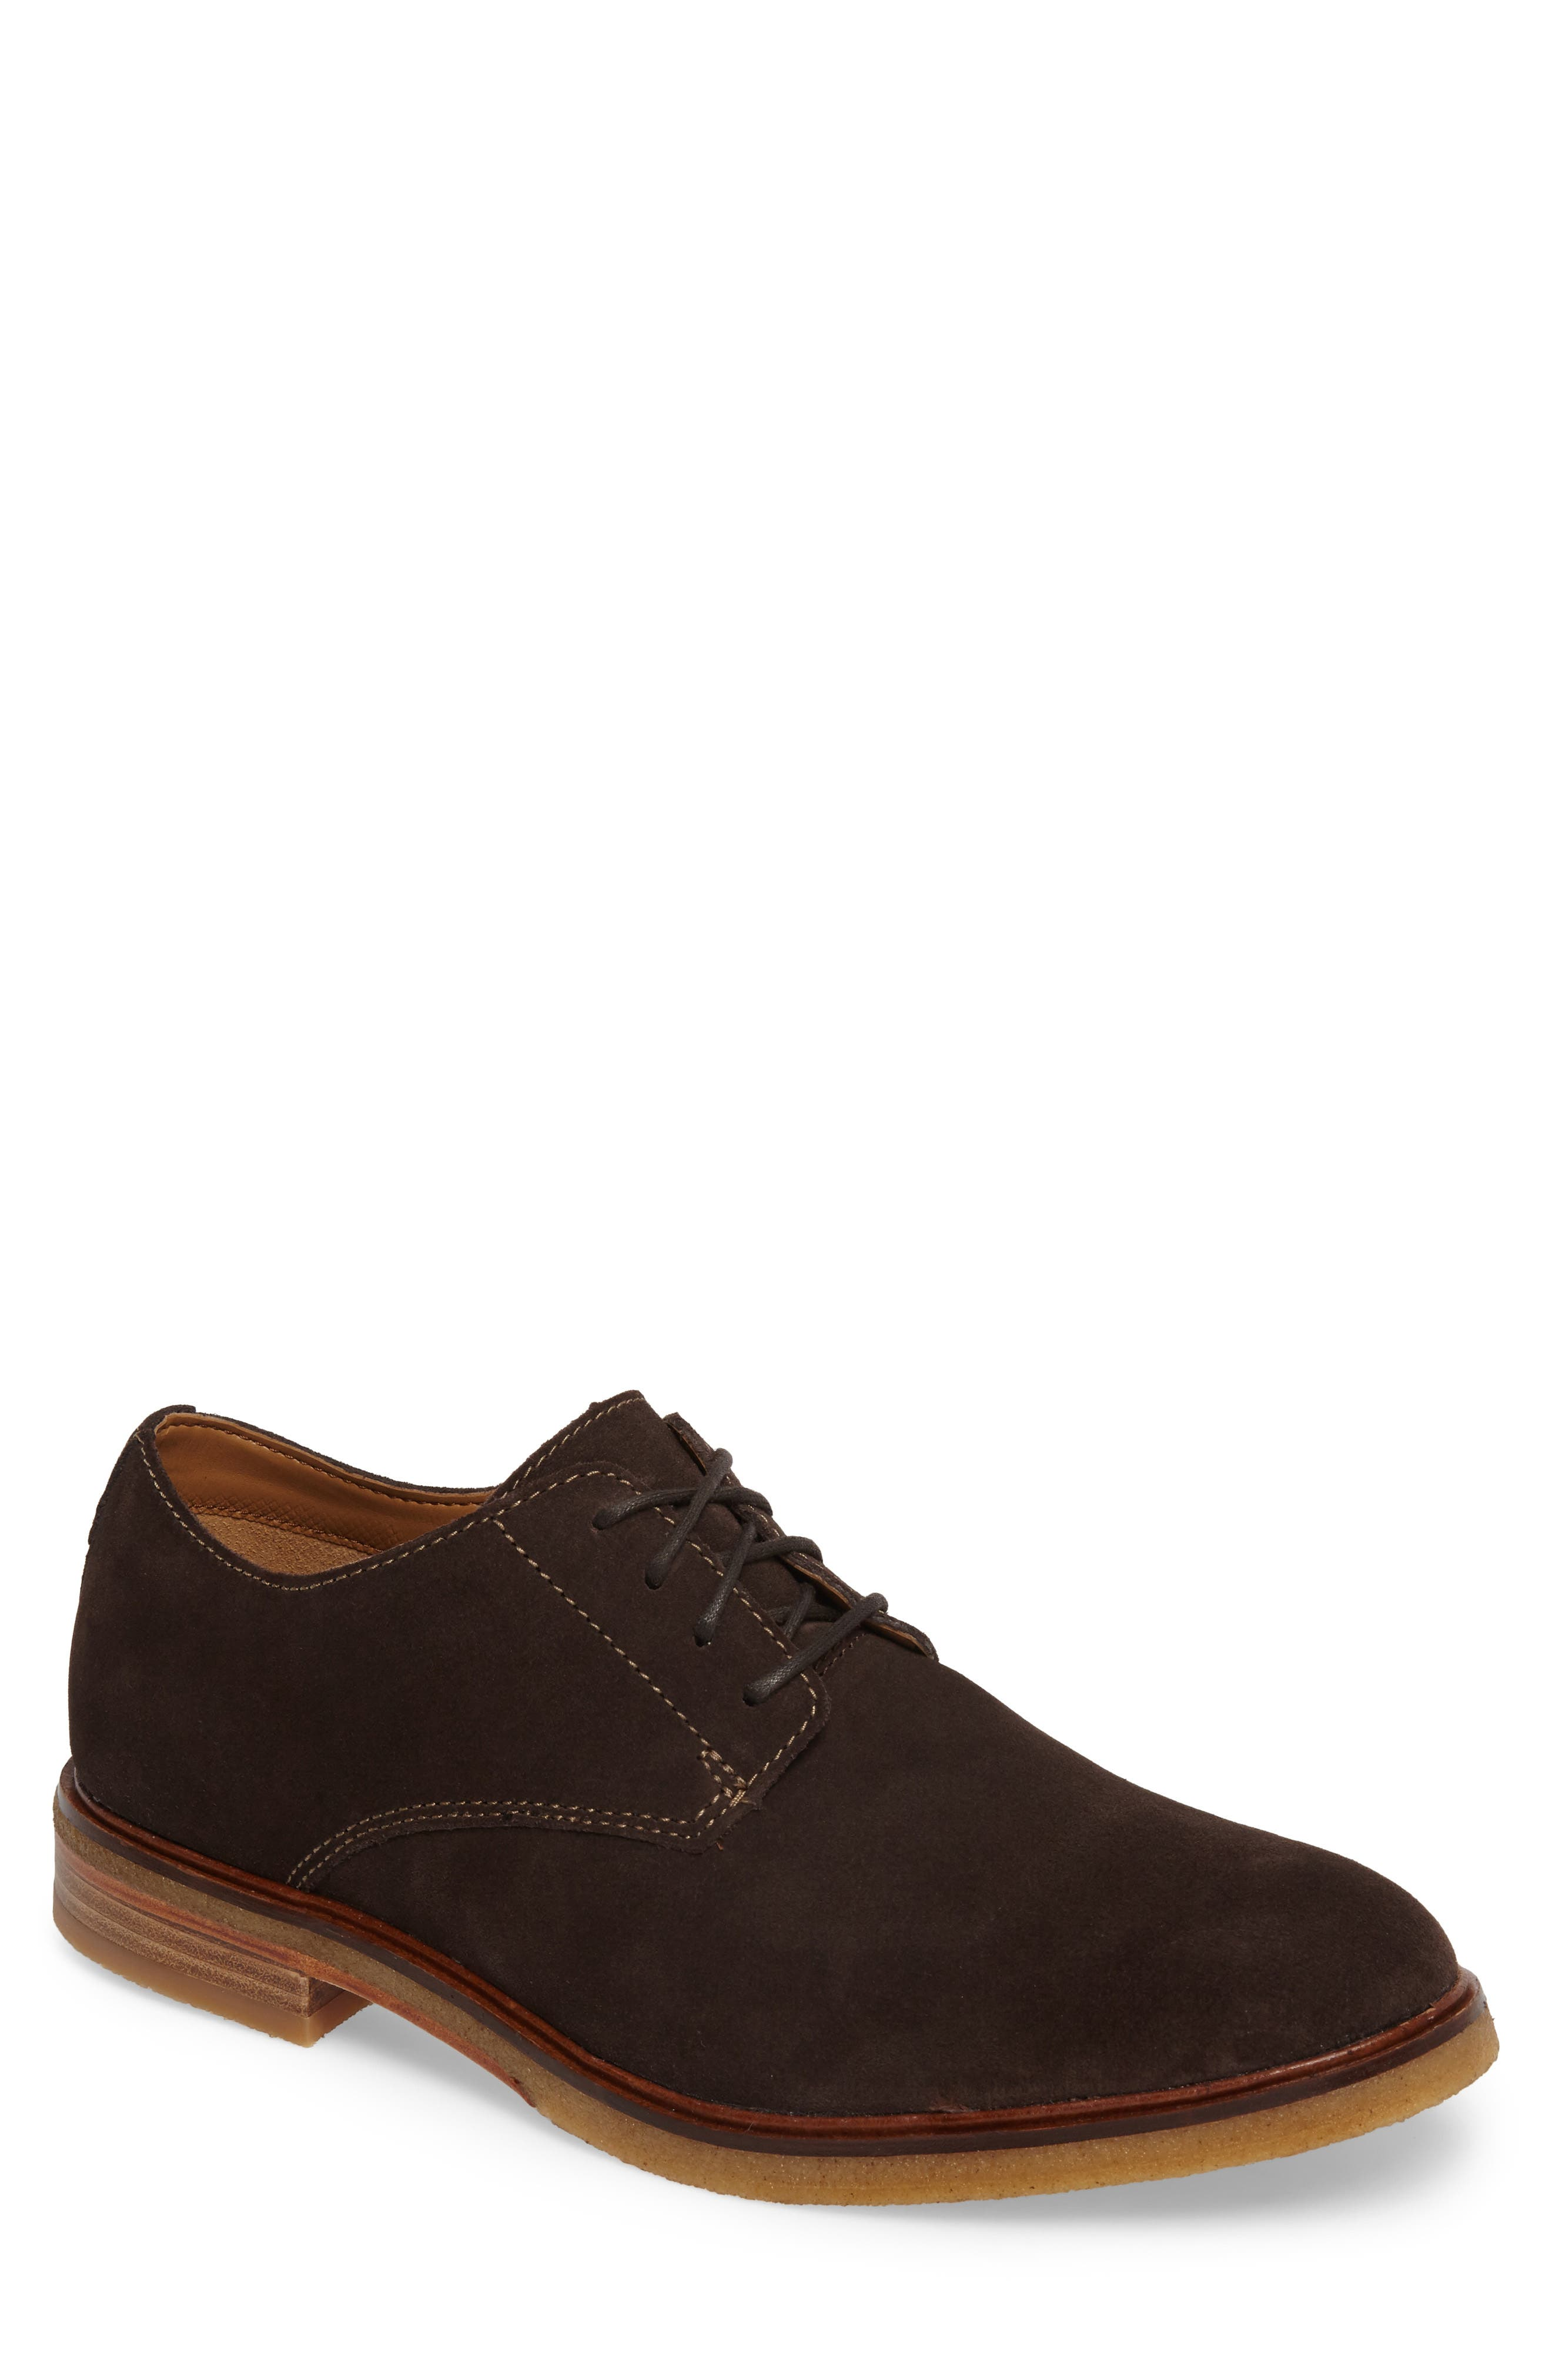 Alternate Image 1 Selected - Clarks Clarkdale Moon Buck Shoe (Men)